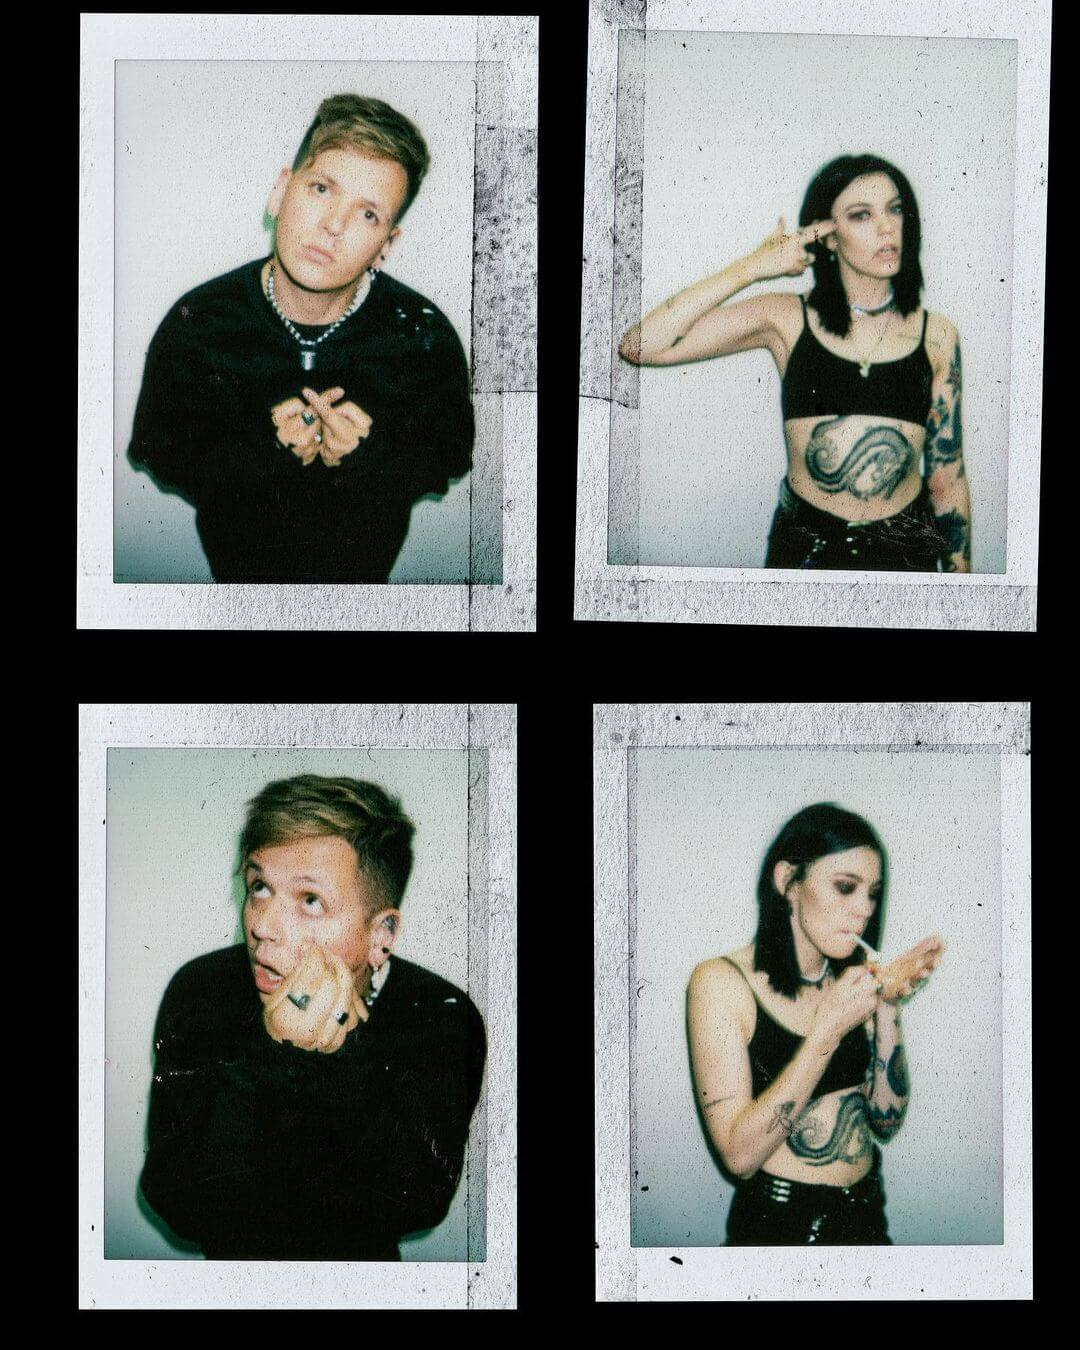 Hot Milk band photo - Underground blog